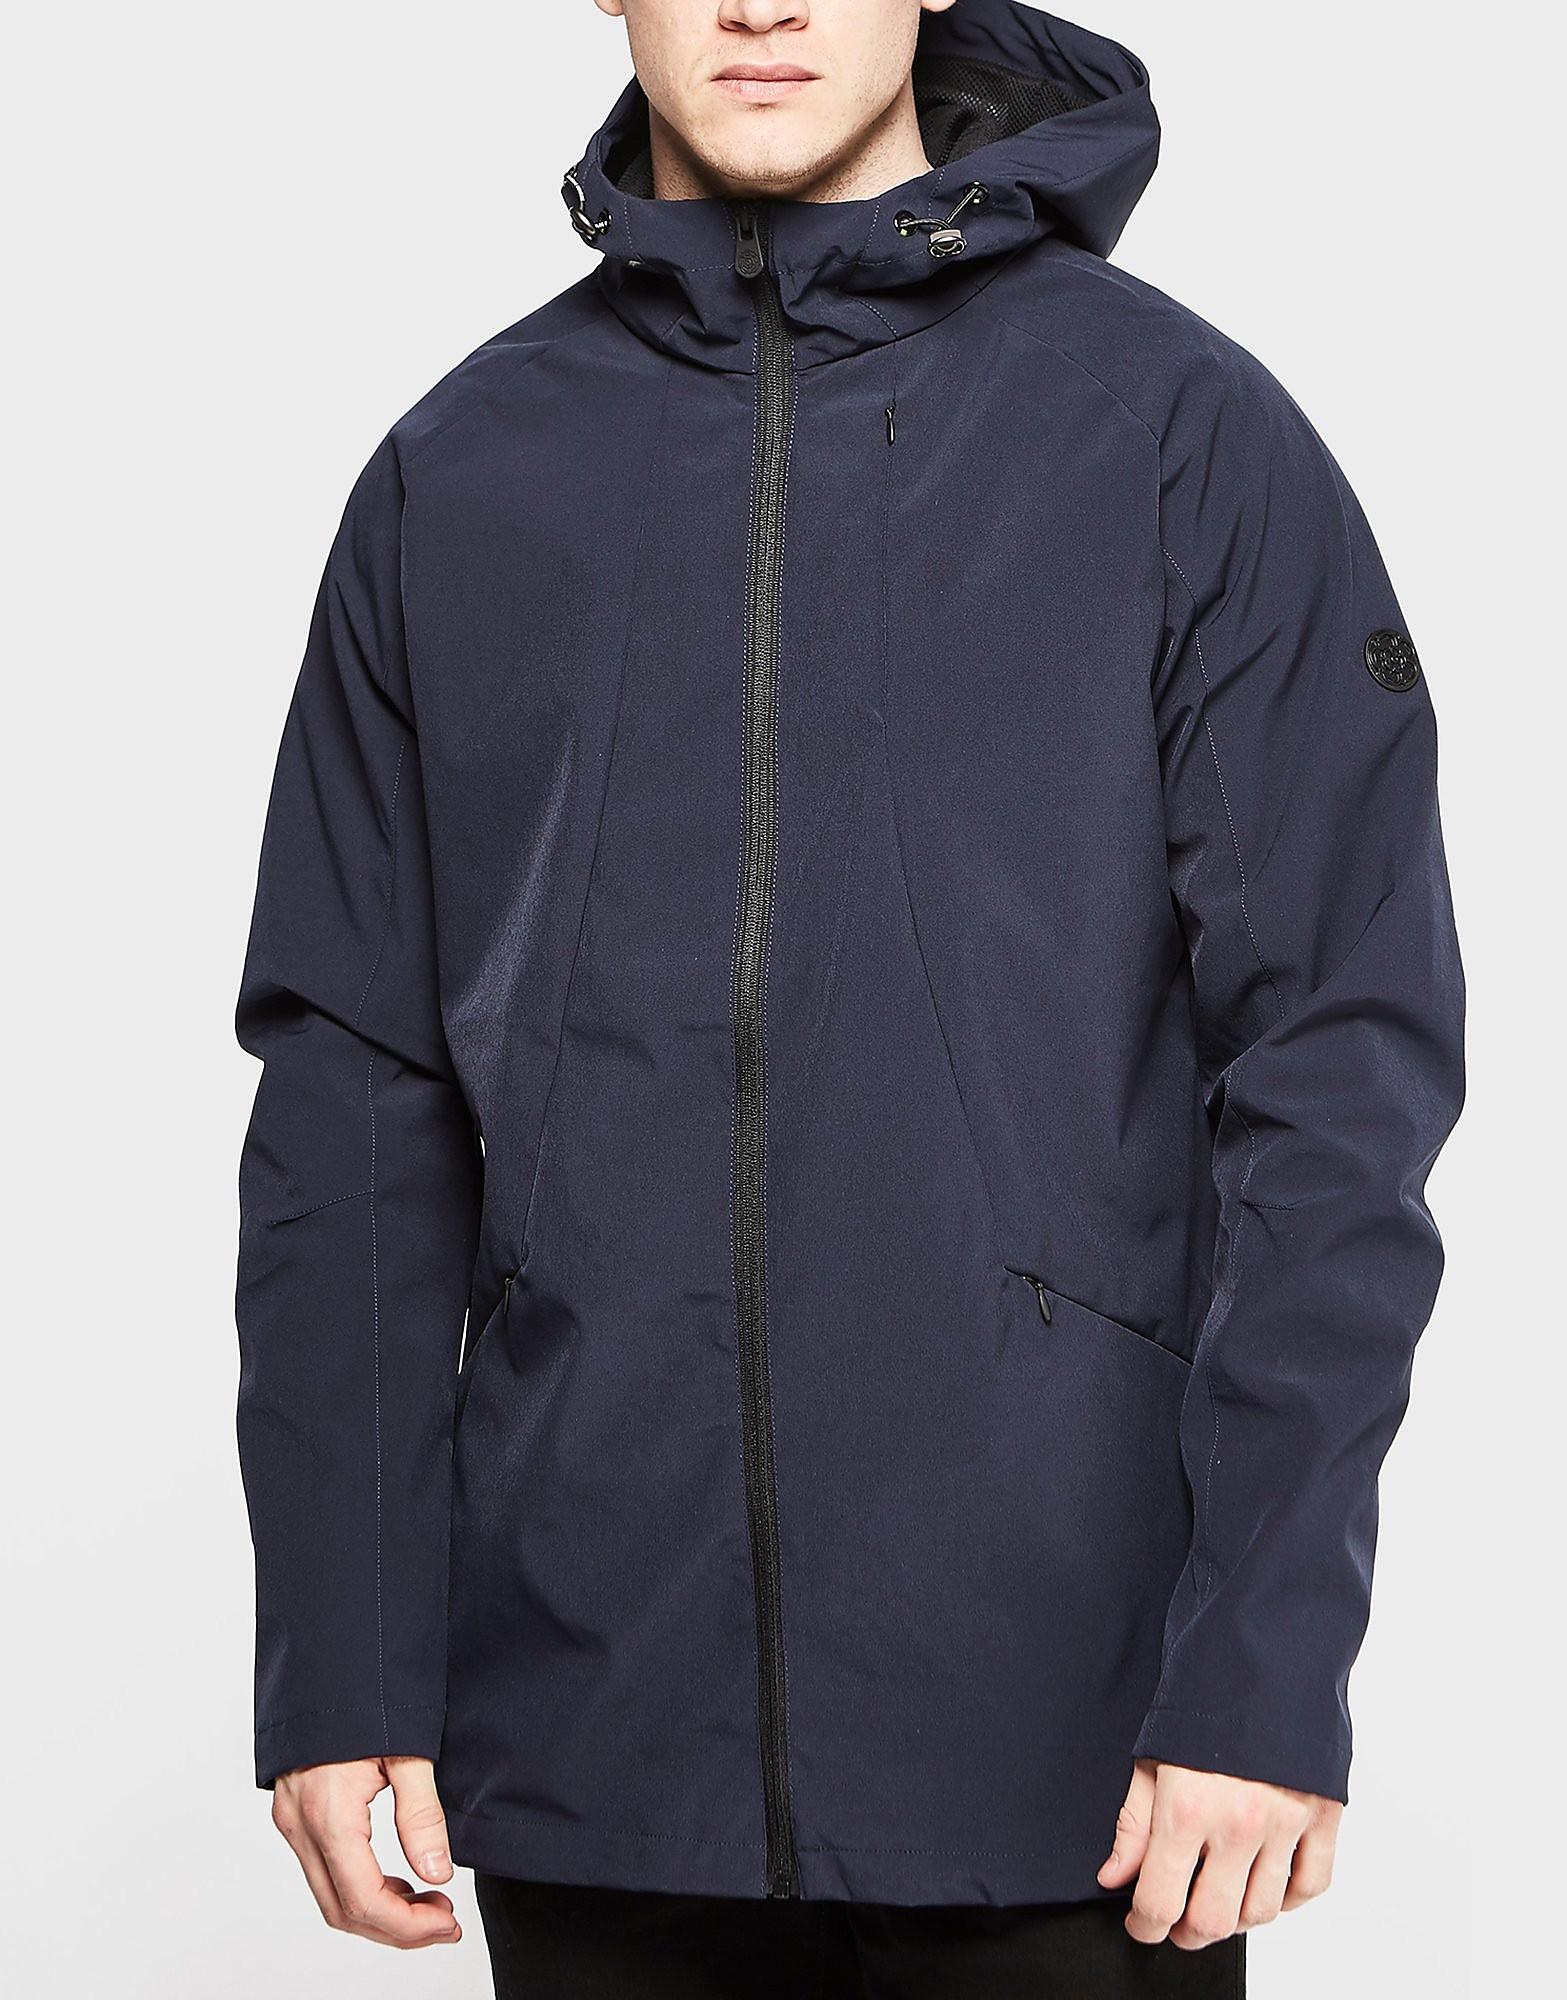 Nicholas Deakins Ultra Jacket - Exclusive